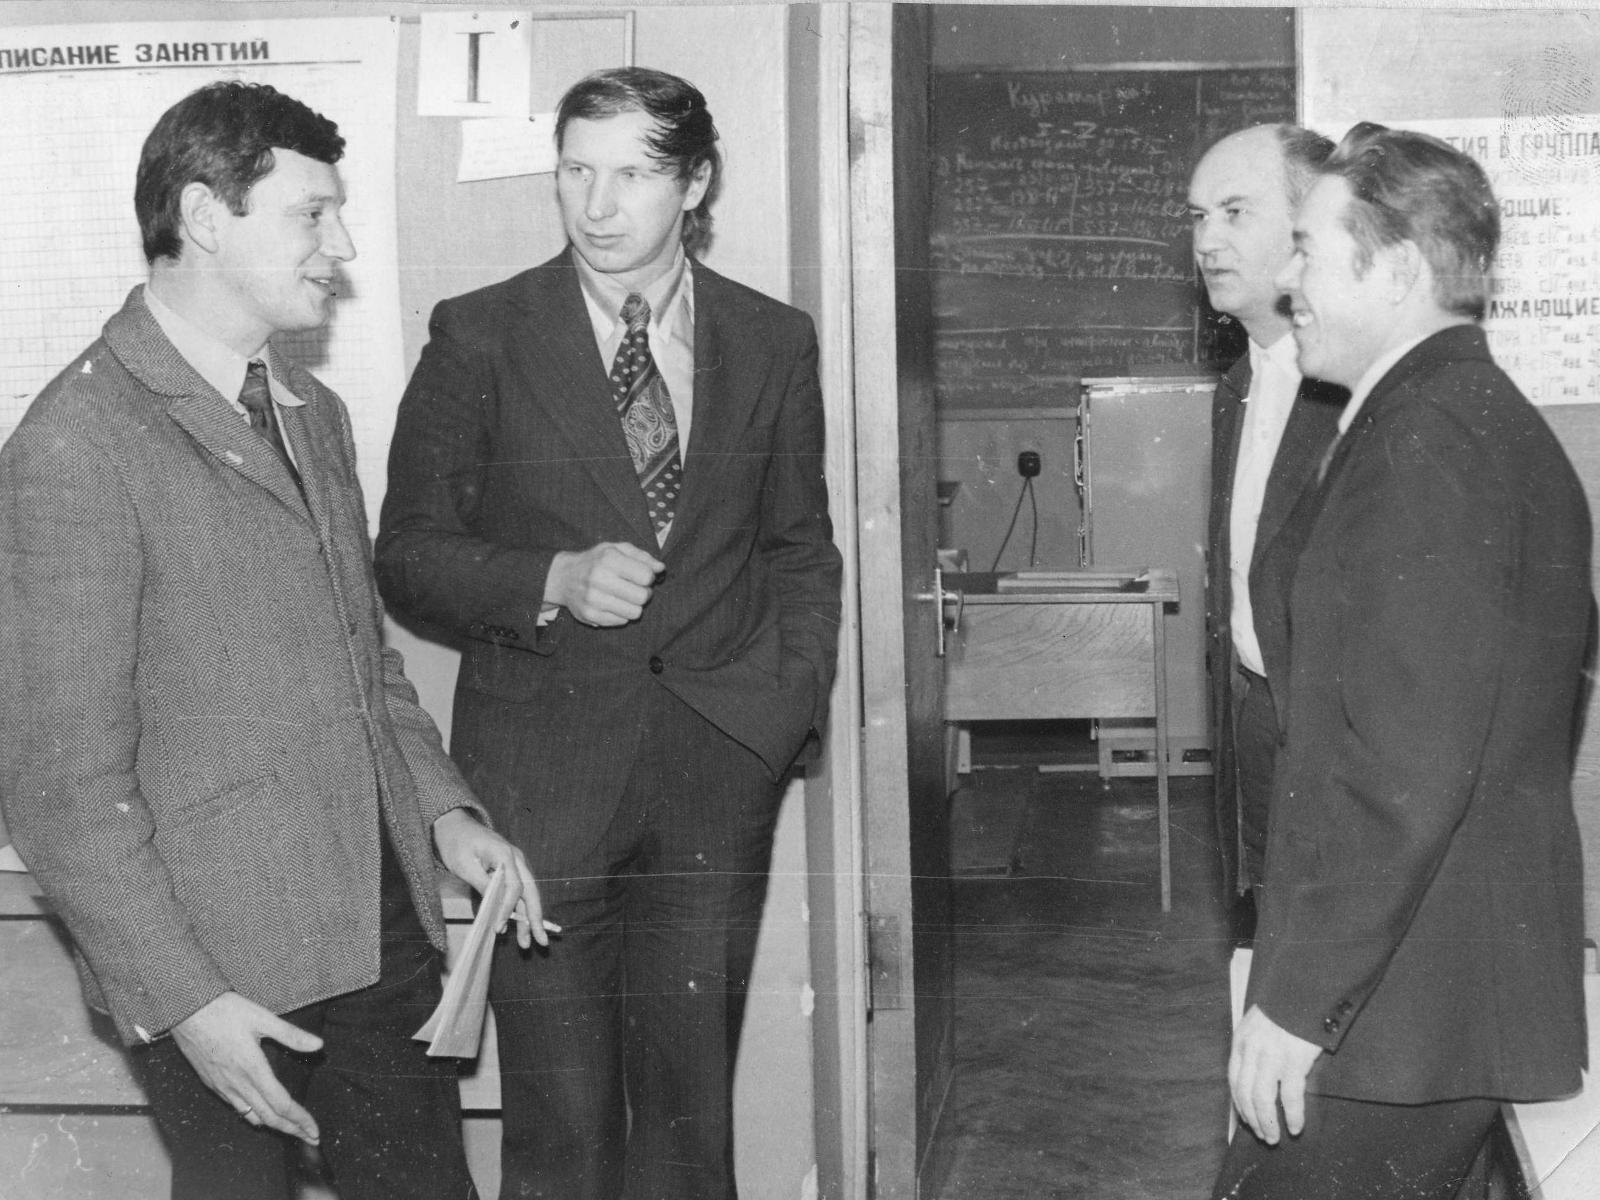 Слева-направо В.Л. Дорот, И.П. Горчаков, В.К. Бреев, И.А. Старостин